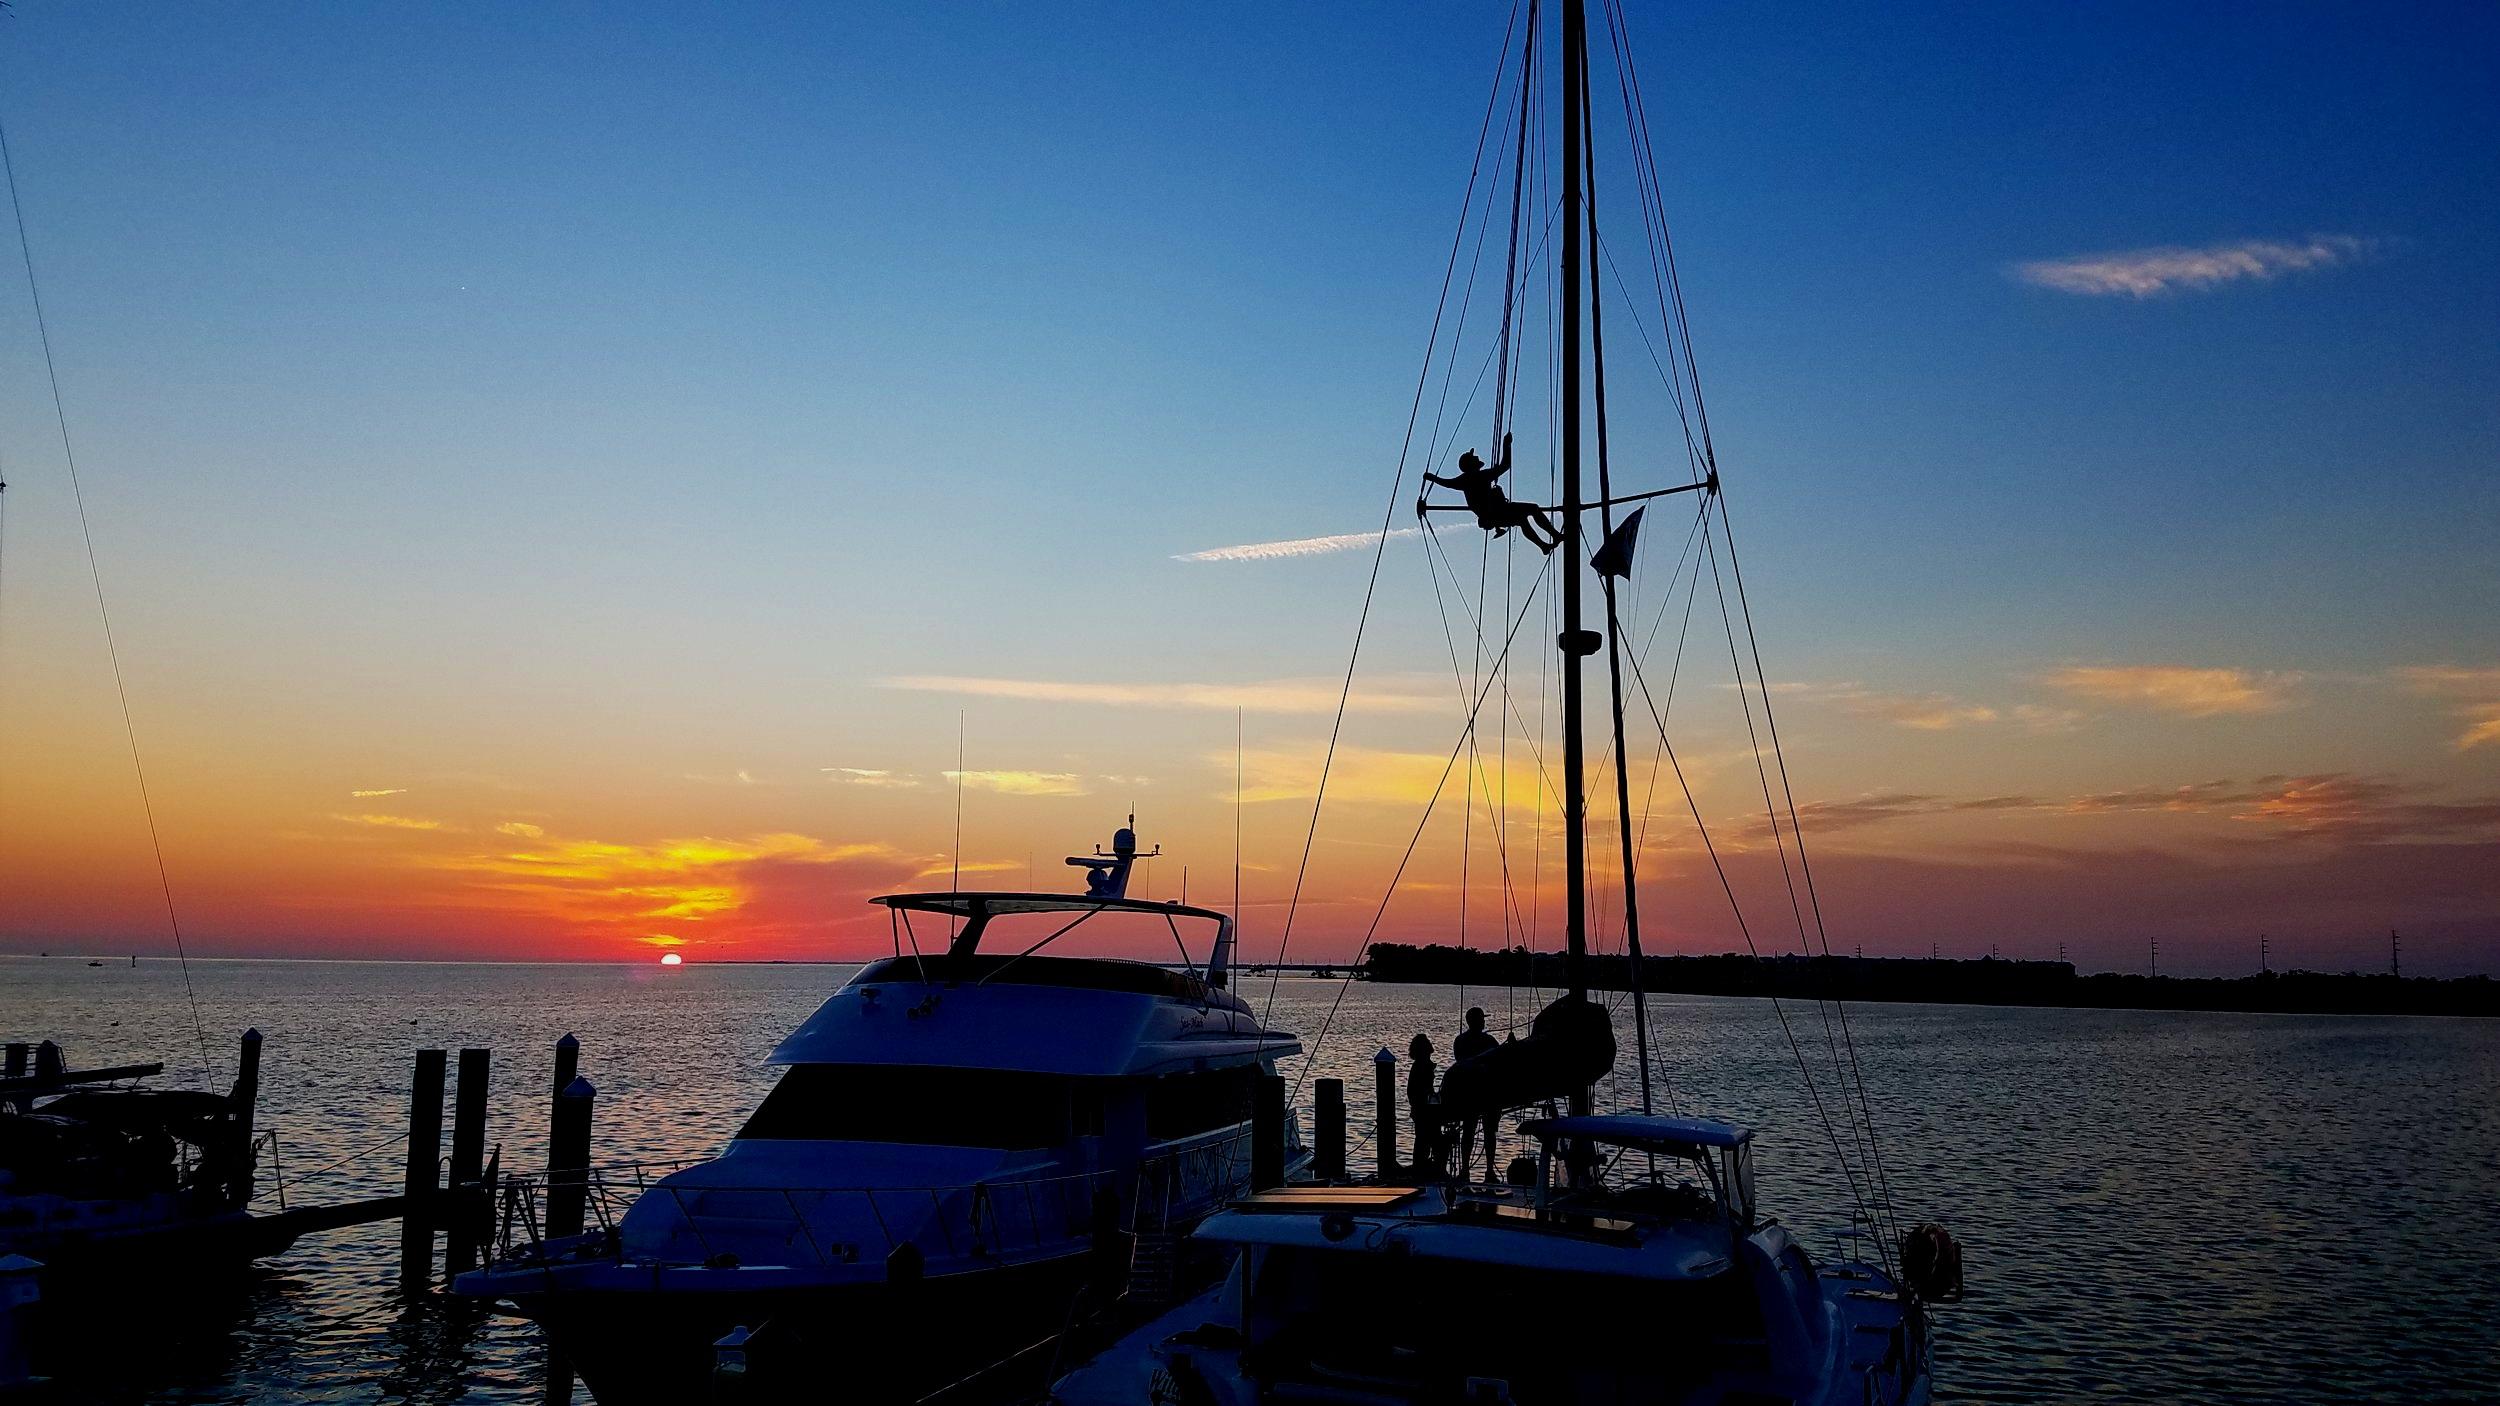 Sunset view from our slip at Marathon Marina, FL